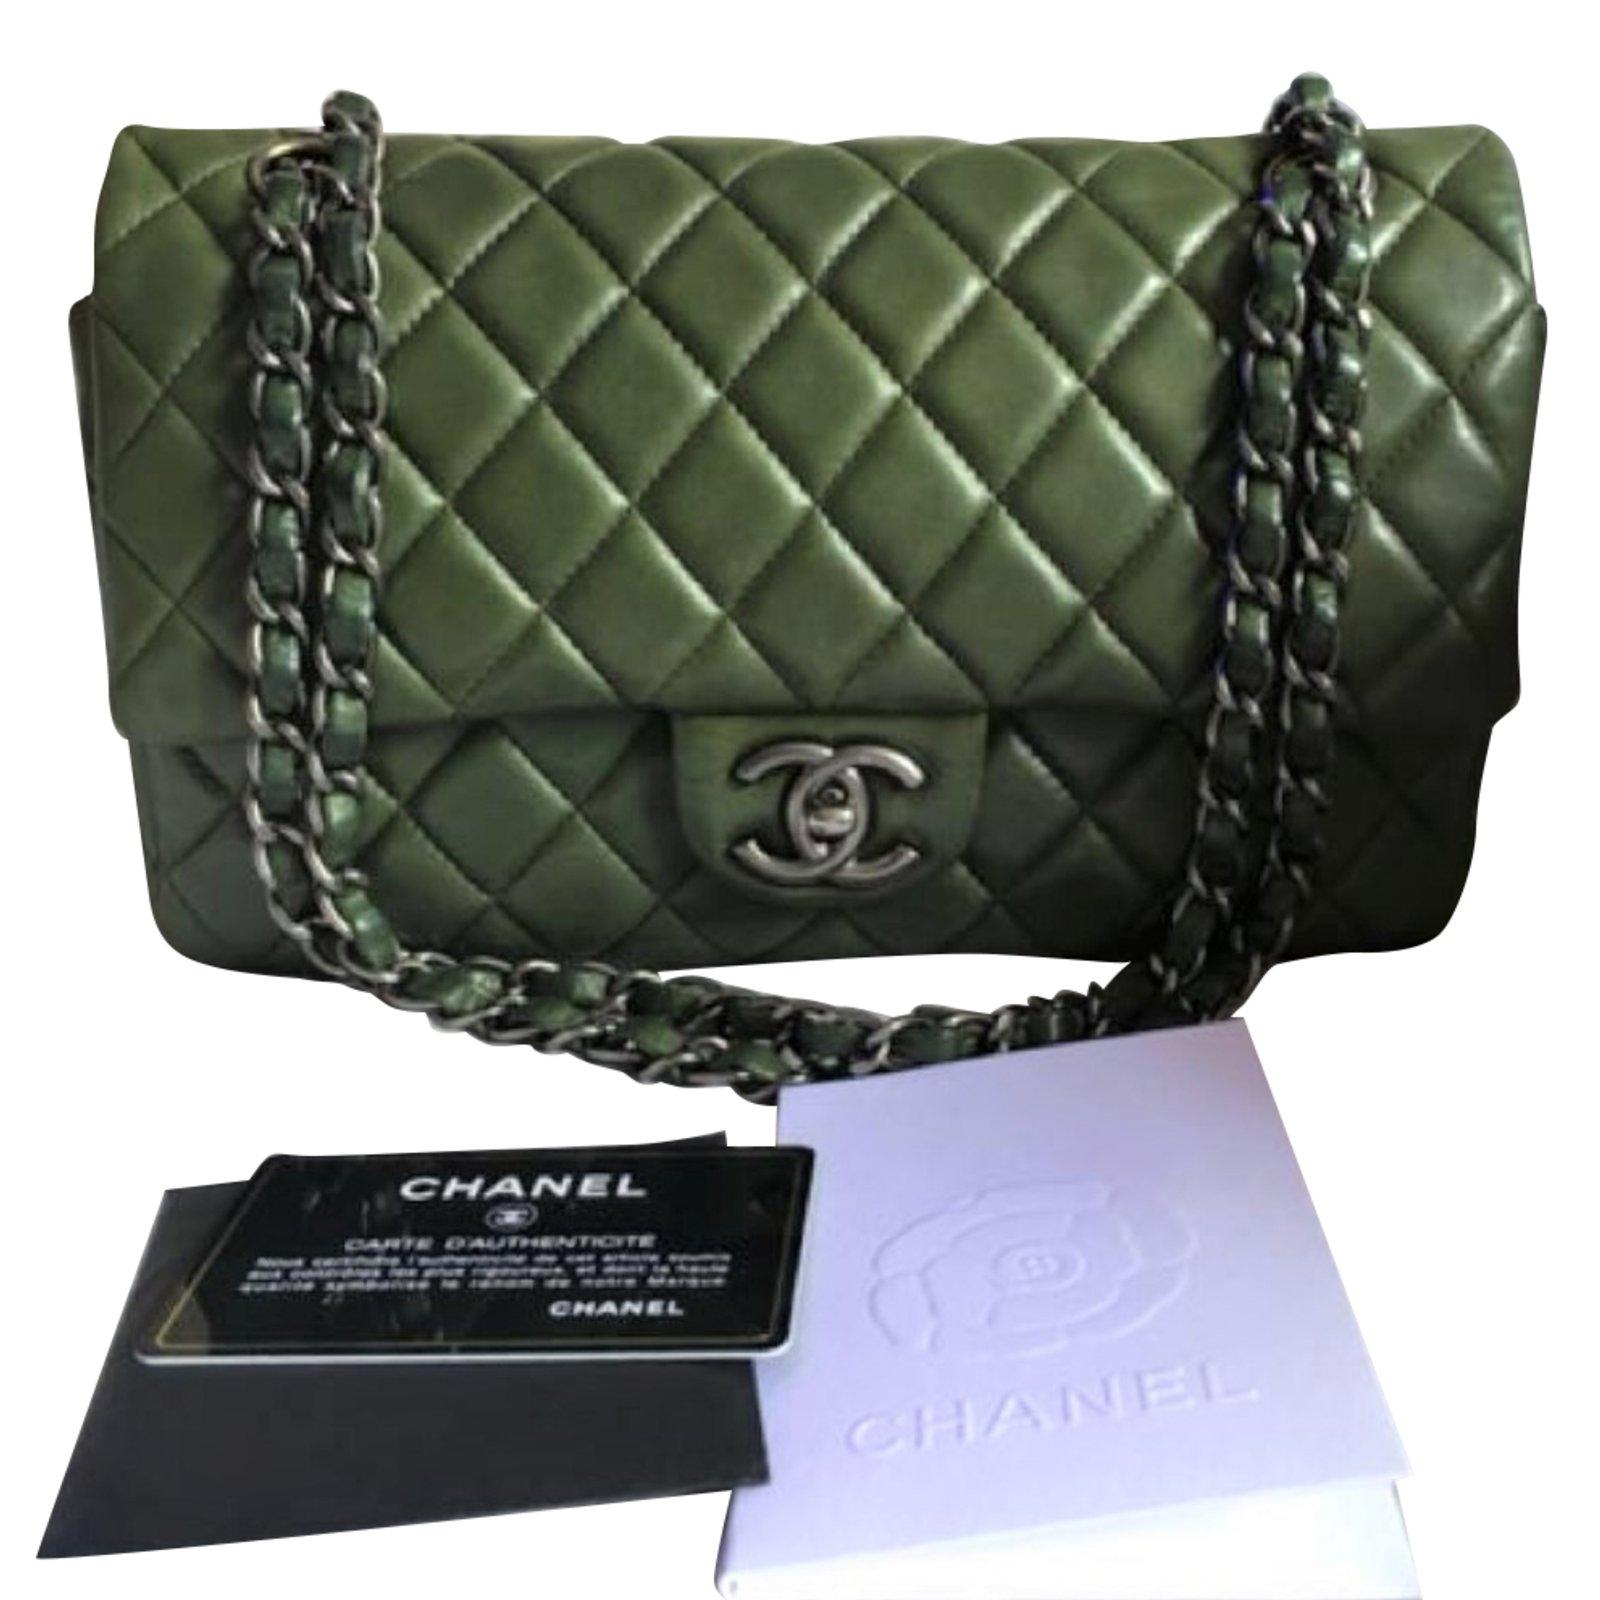 957016c85f7b Chanel Chanel Classic Medium flap bag. Handbags Lambskin Green ref.79757